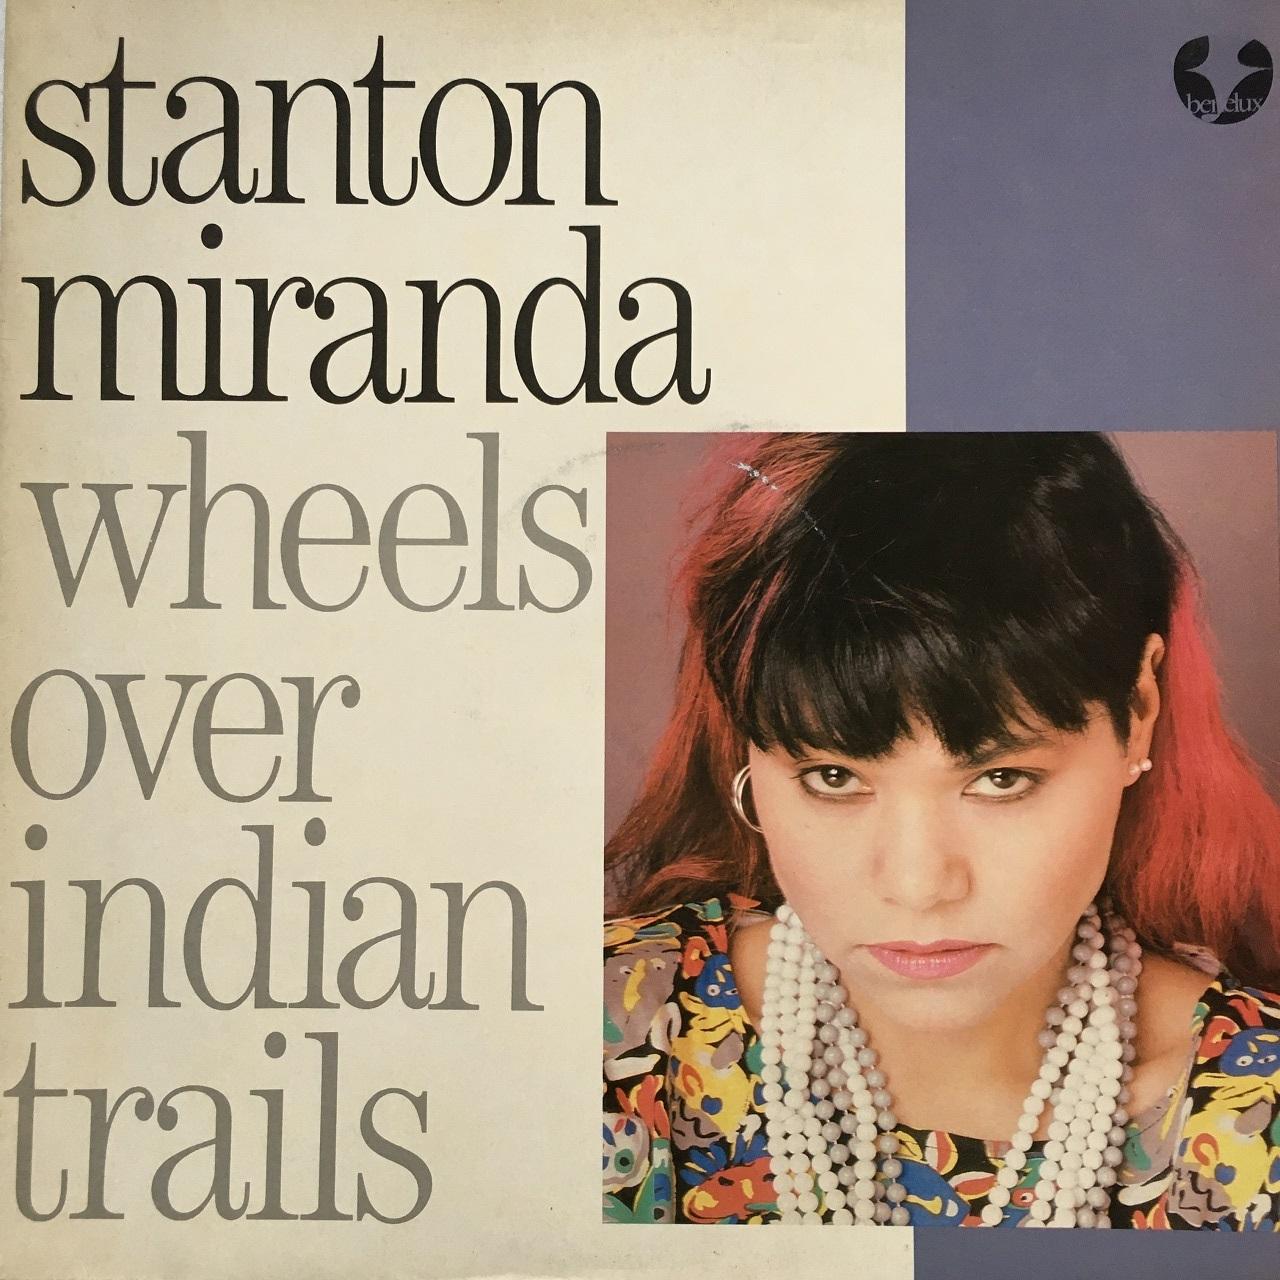 【12inch・ベルギー盤】Stanton Miranda / Wheels Over Indian Trails